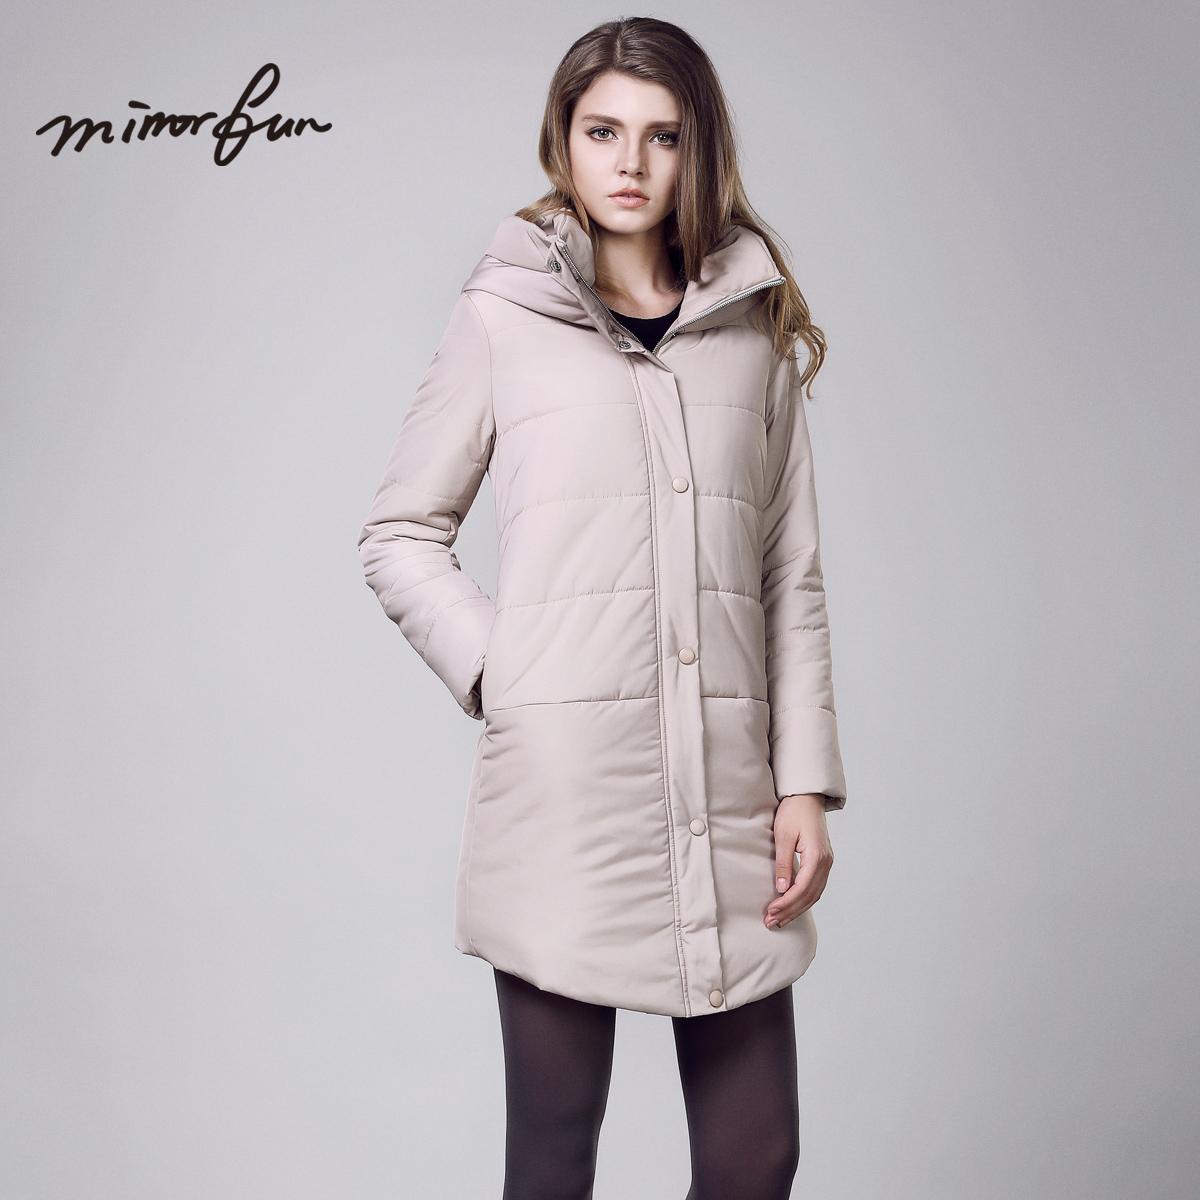 Женская утепленная куртка Mirror Fun m44024